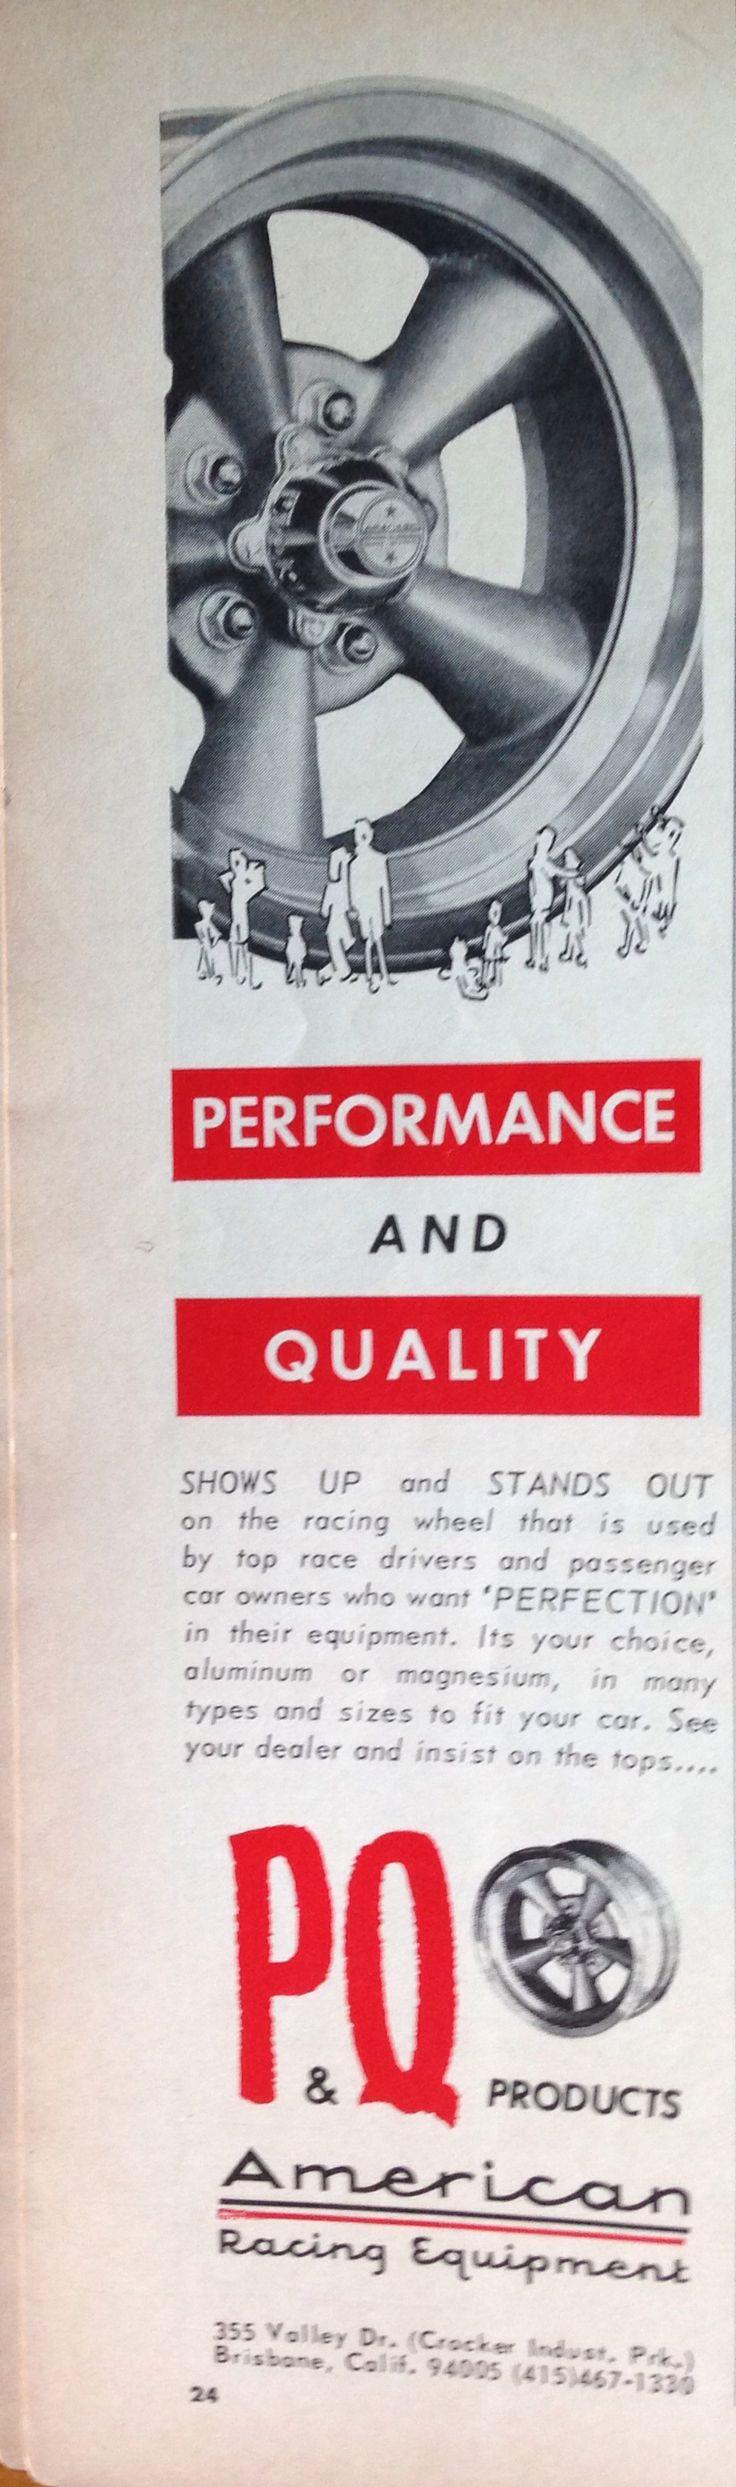 American Racing Wheels P&Q Equipment advertisement from 1967